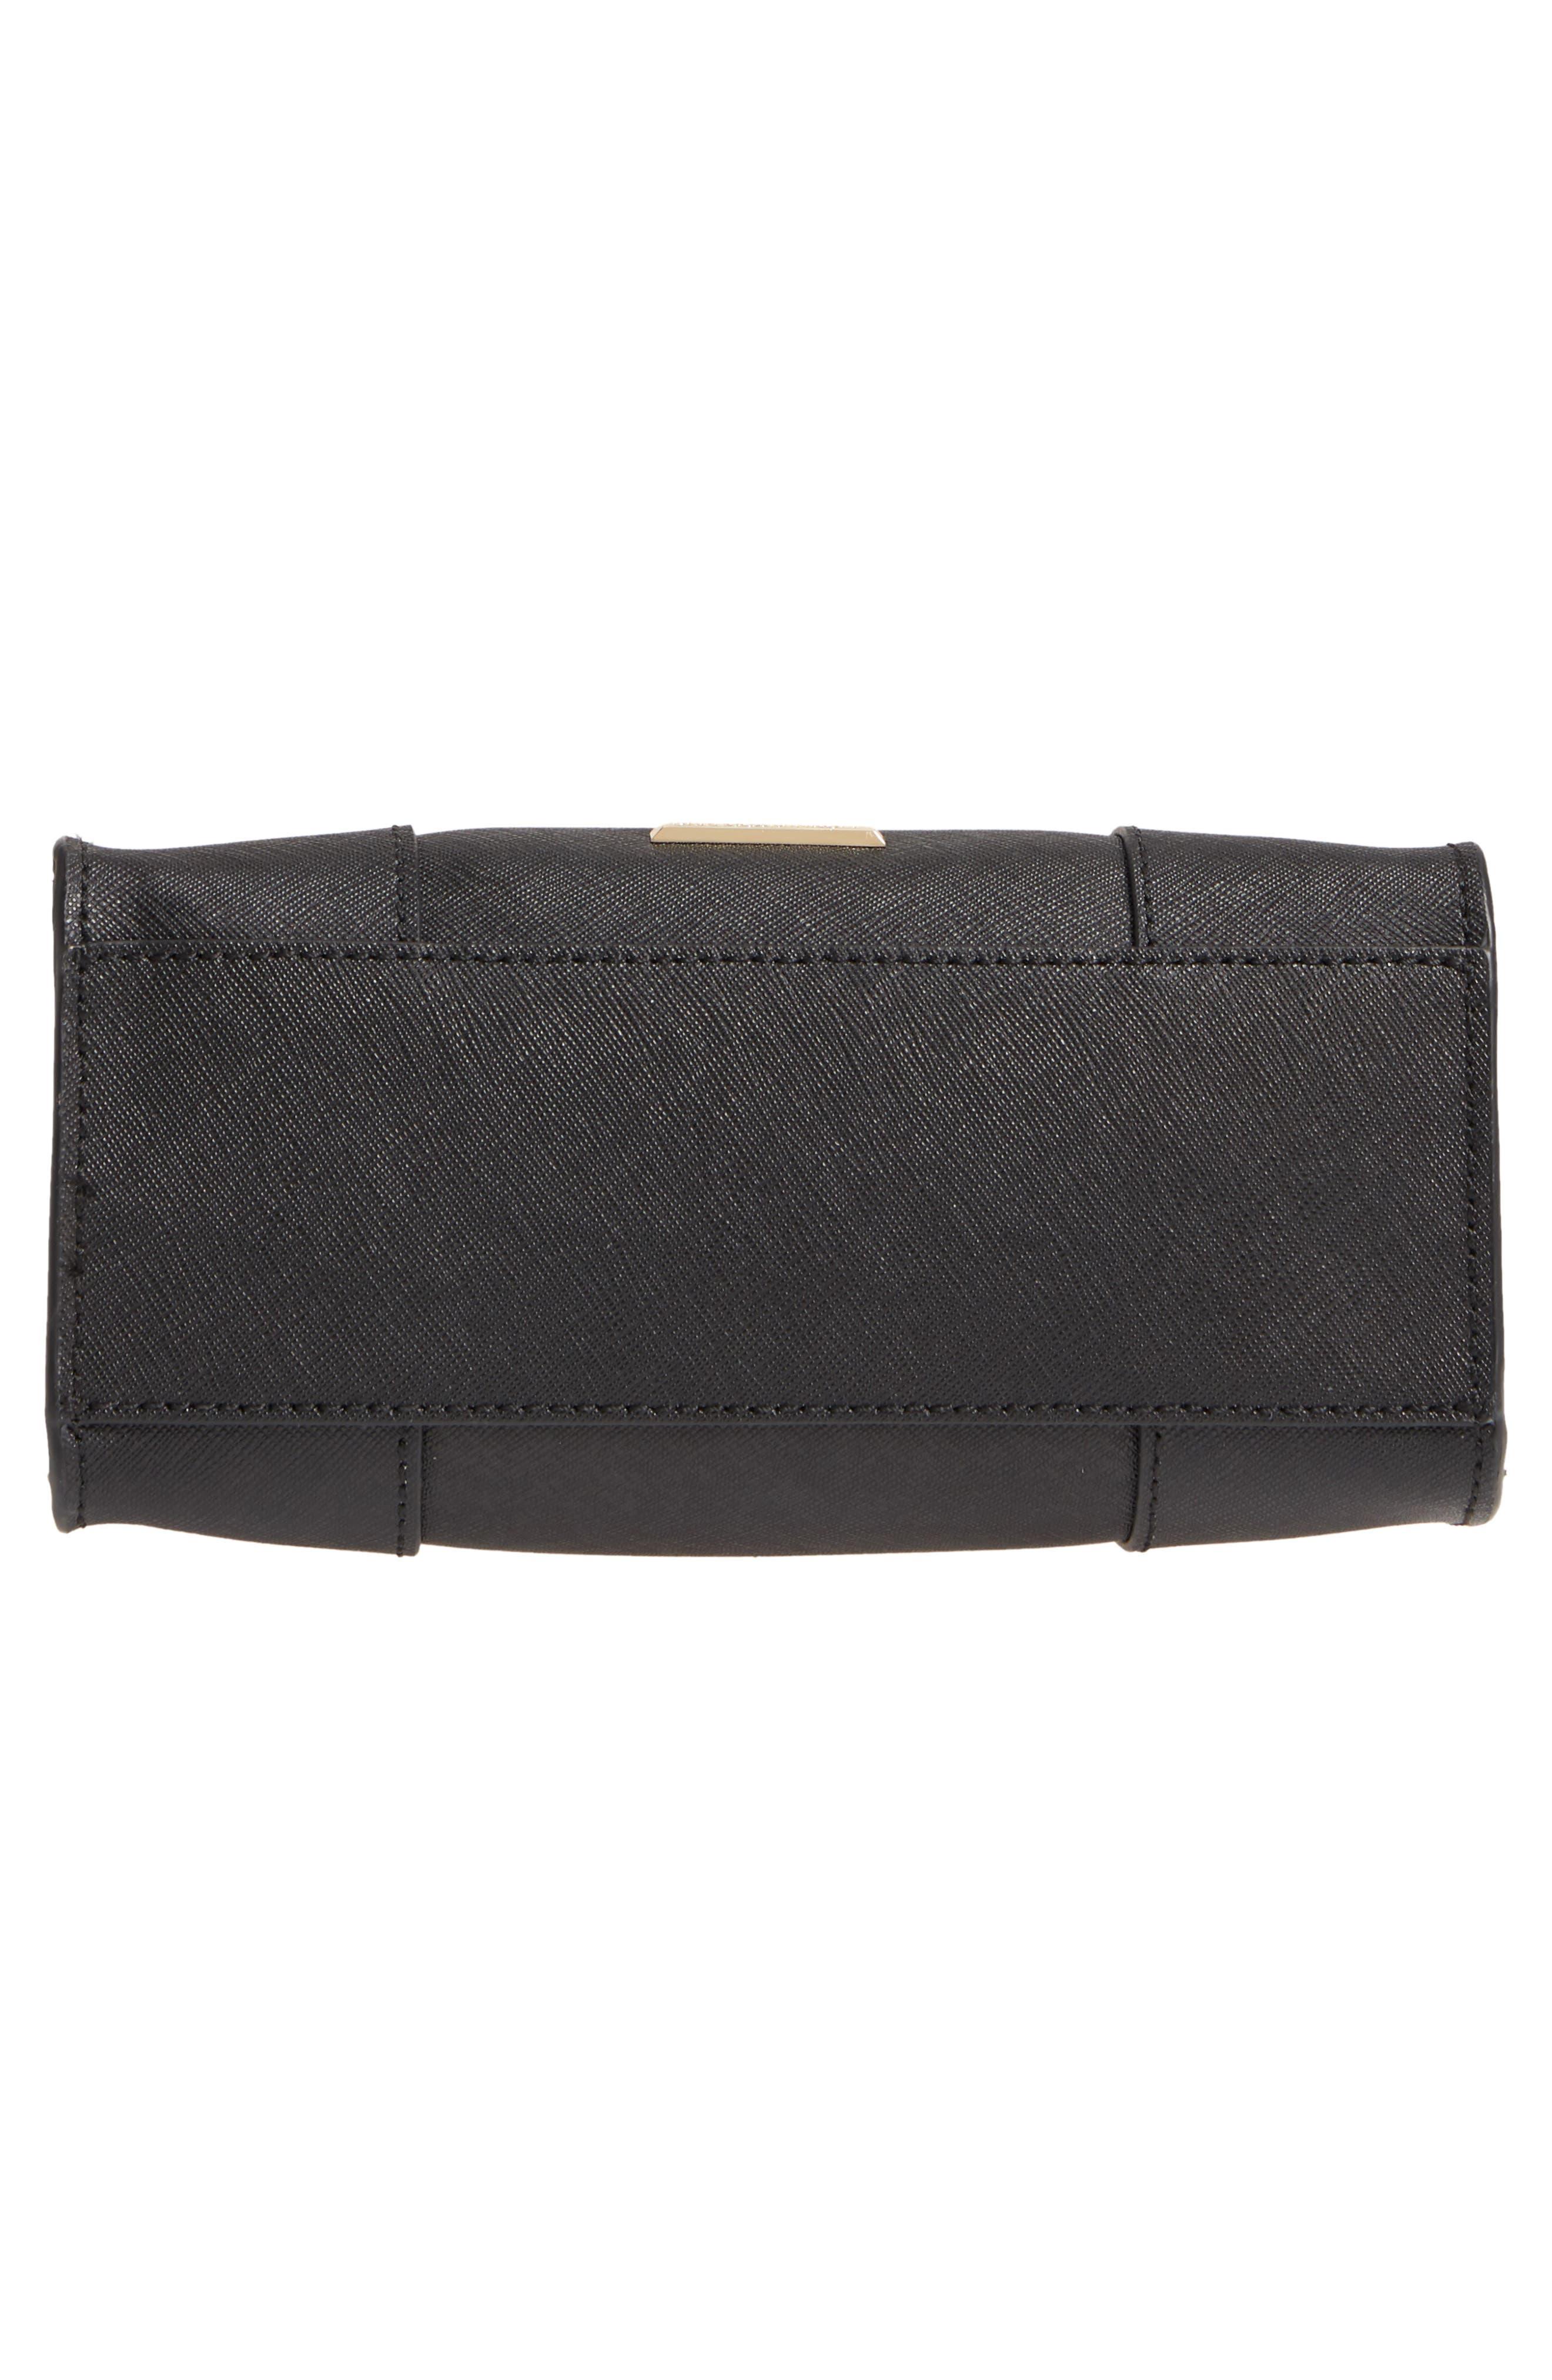 ,                             'Mini MAB Tote' Crossbody Bag,                             Alternate thumbnail 6, color,                             005